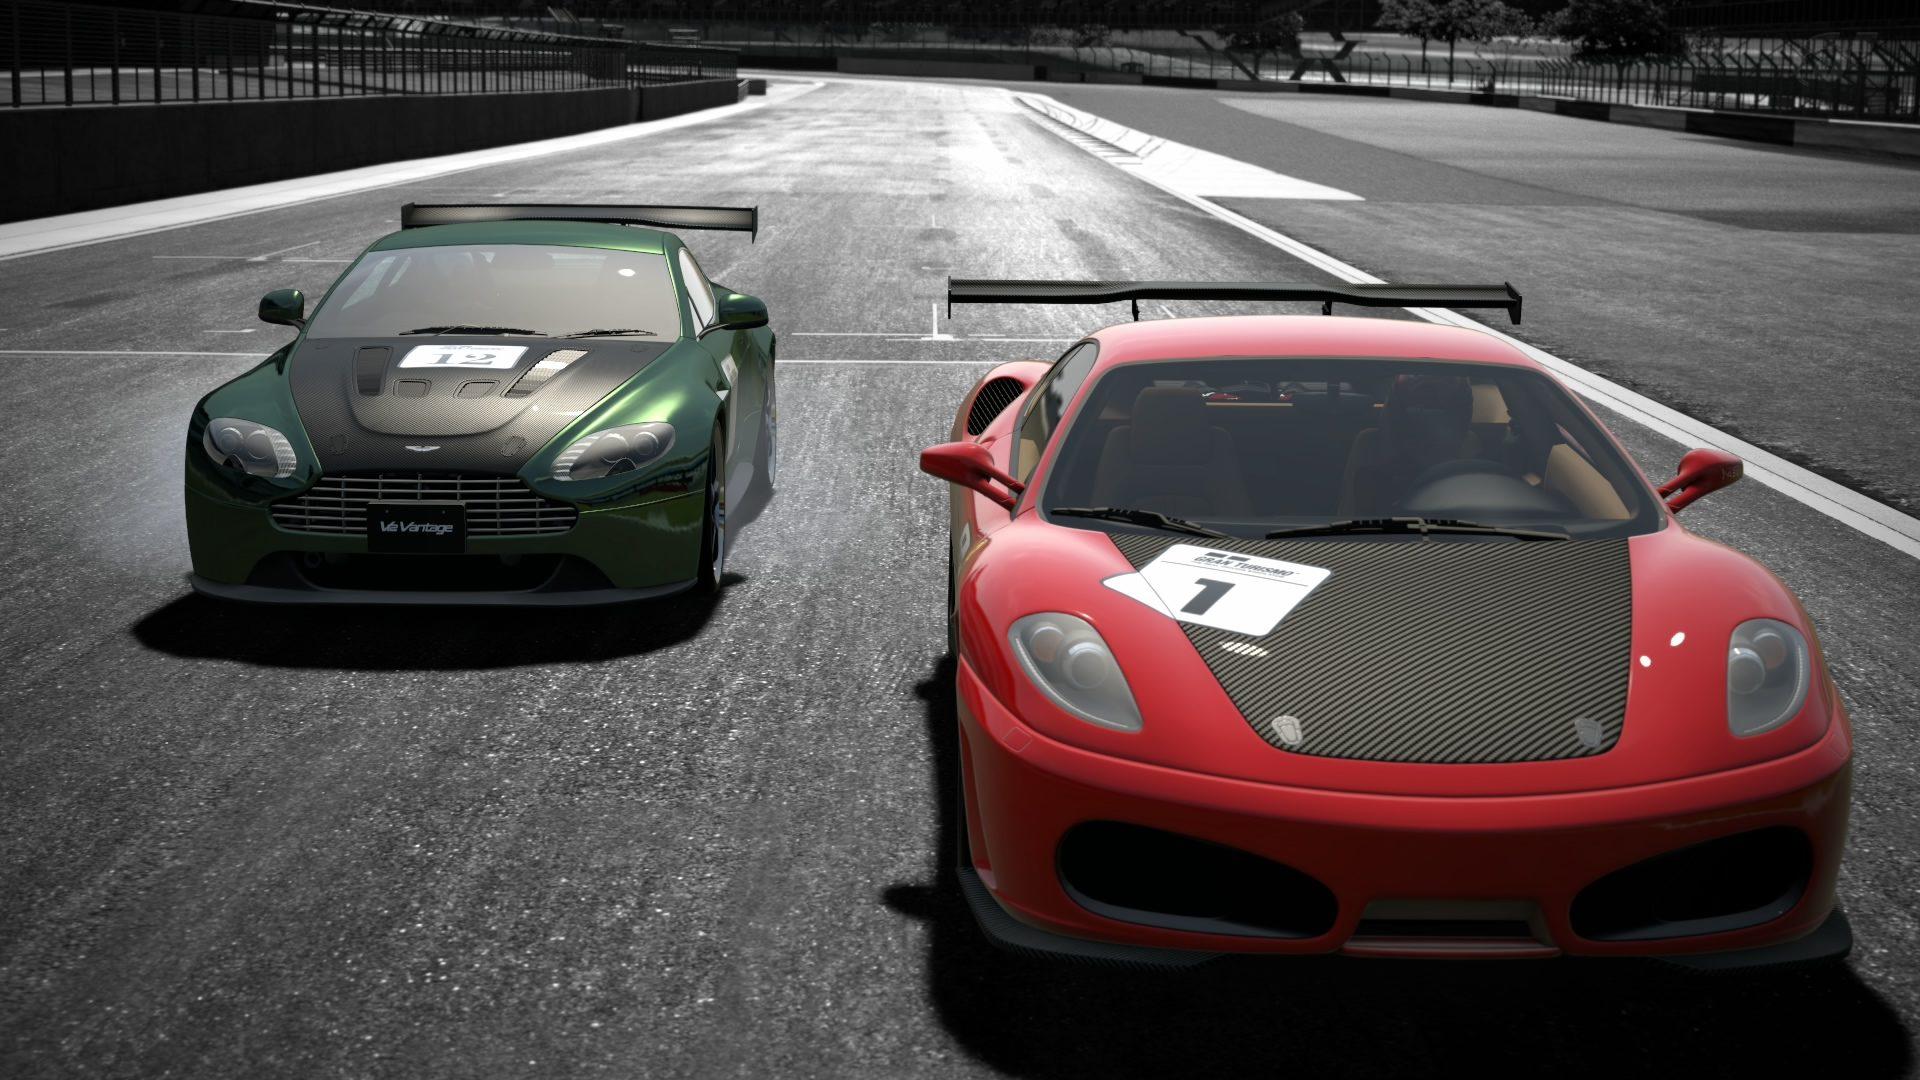 Silverstone International Circuit_1.jpg